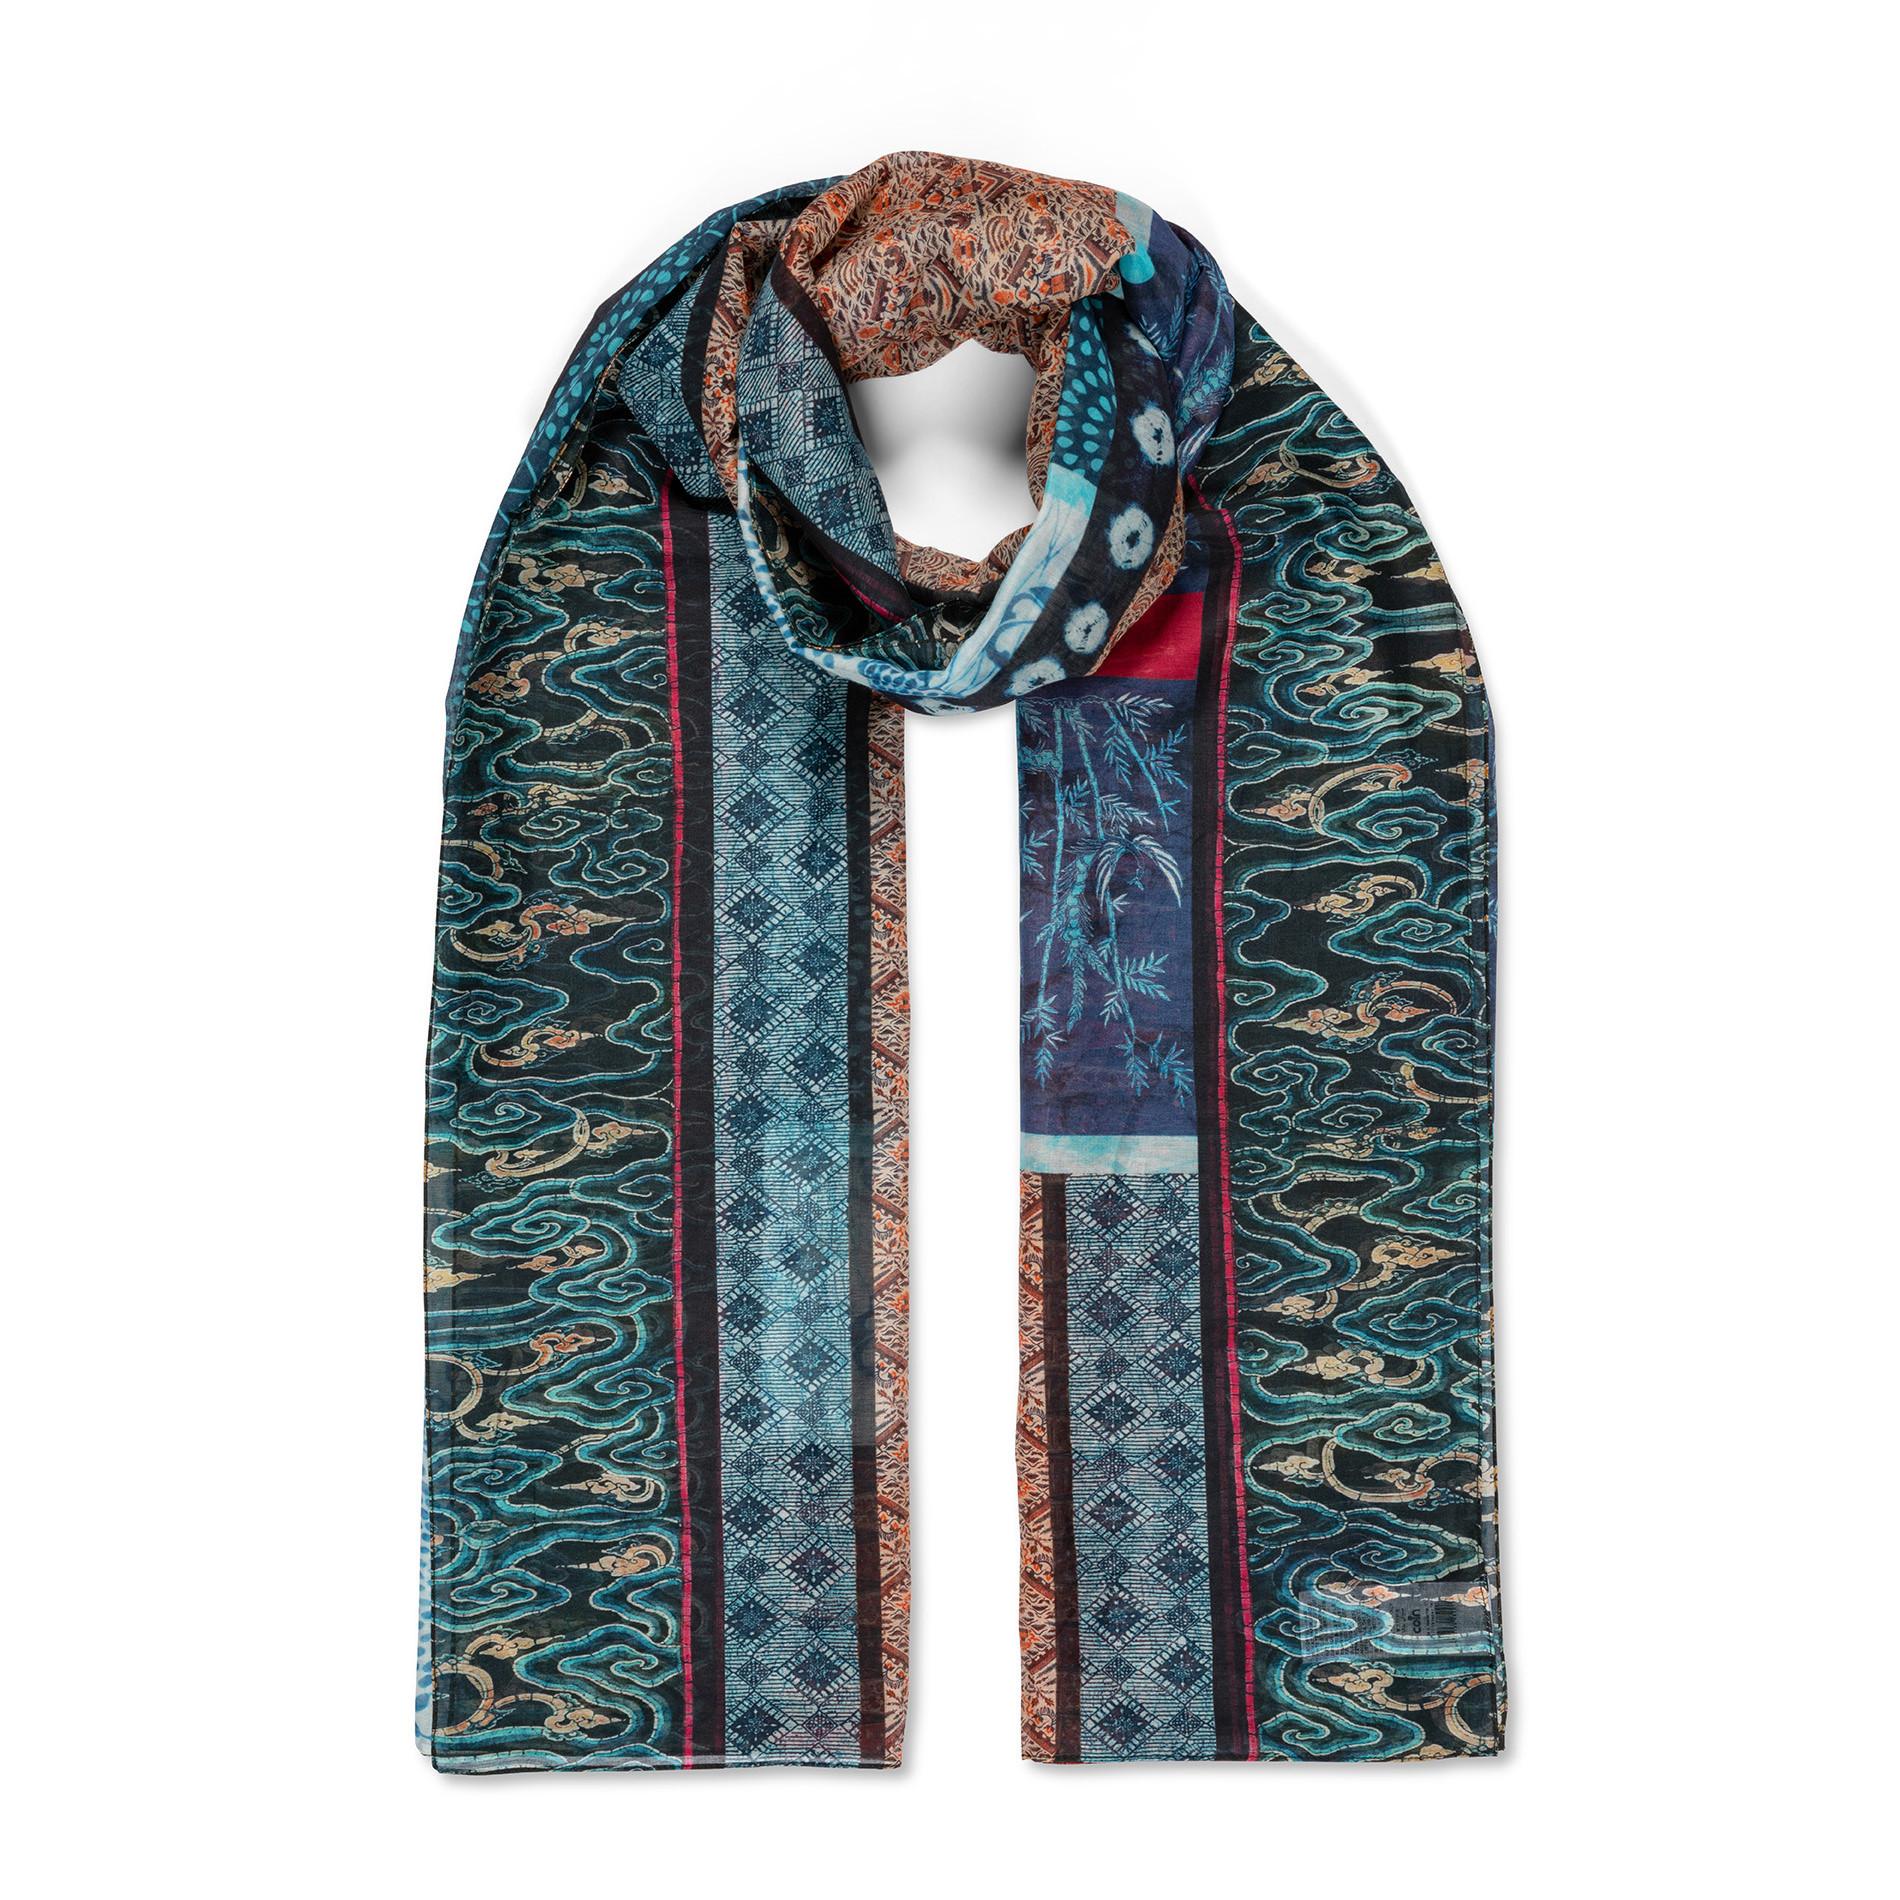 Pareo misto seta stampa india Koan, Blu, large image number 1